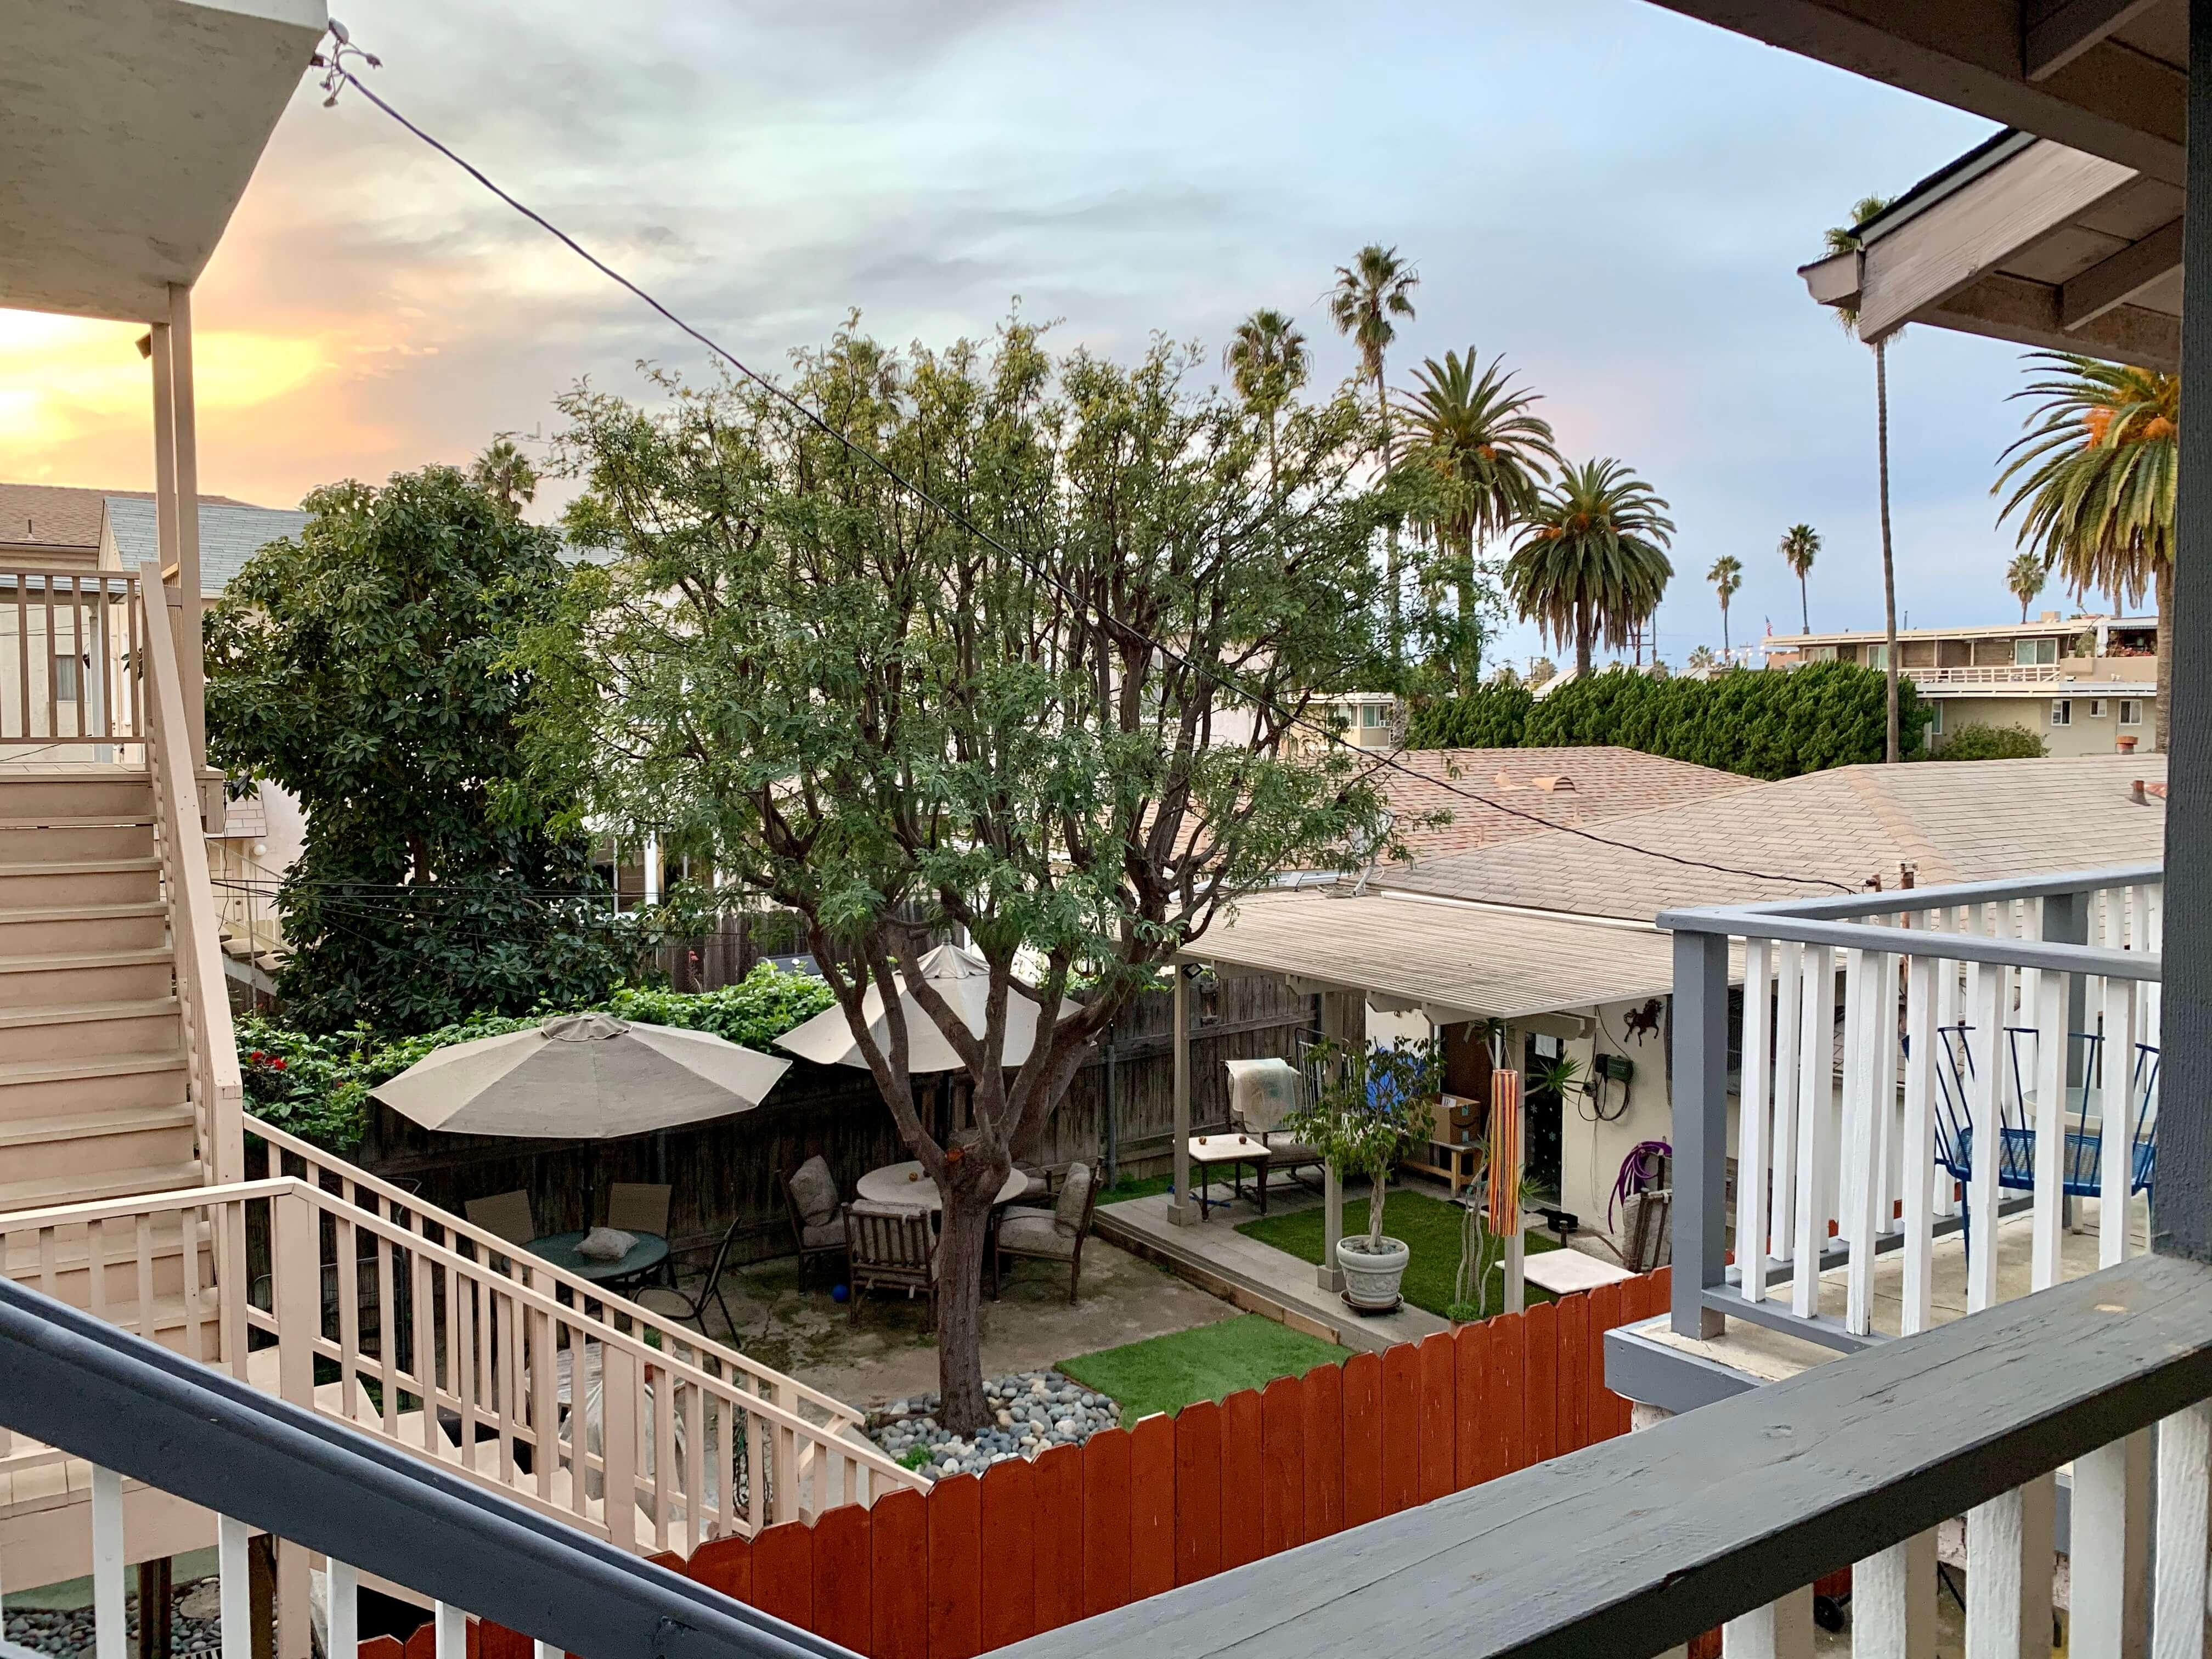 San Diego beautiful view from balcony